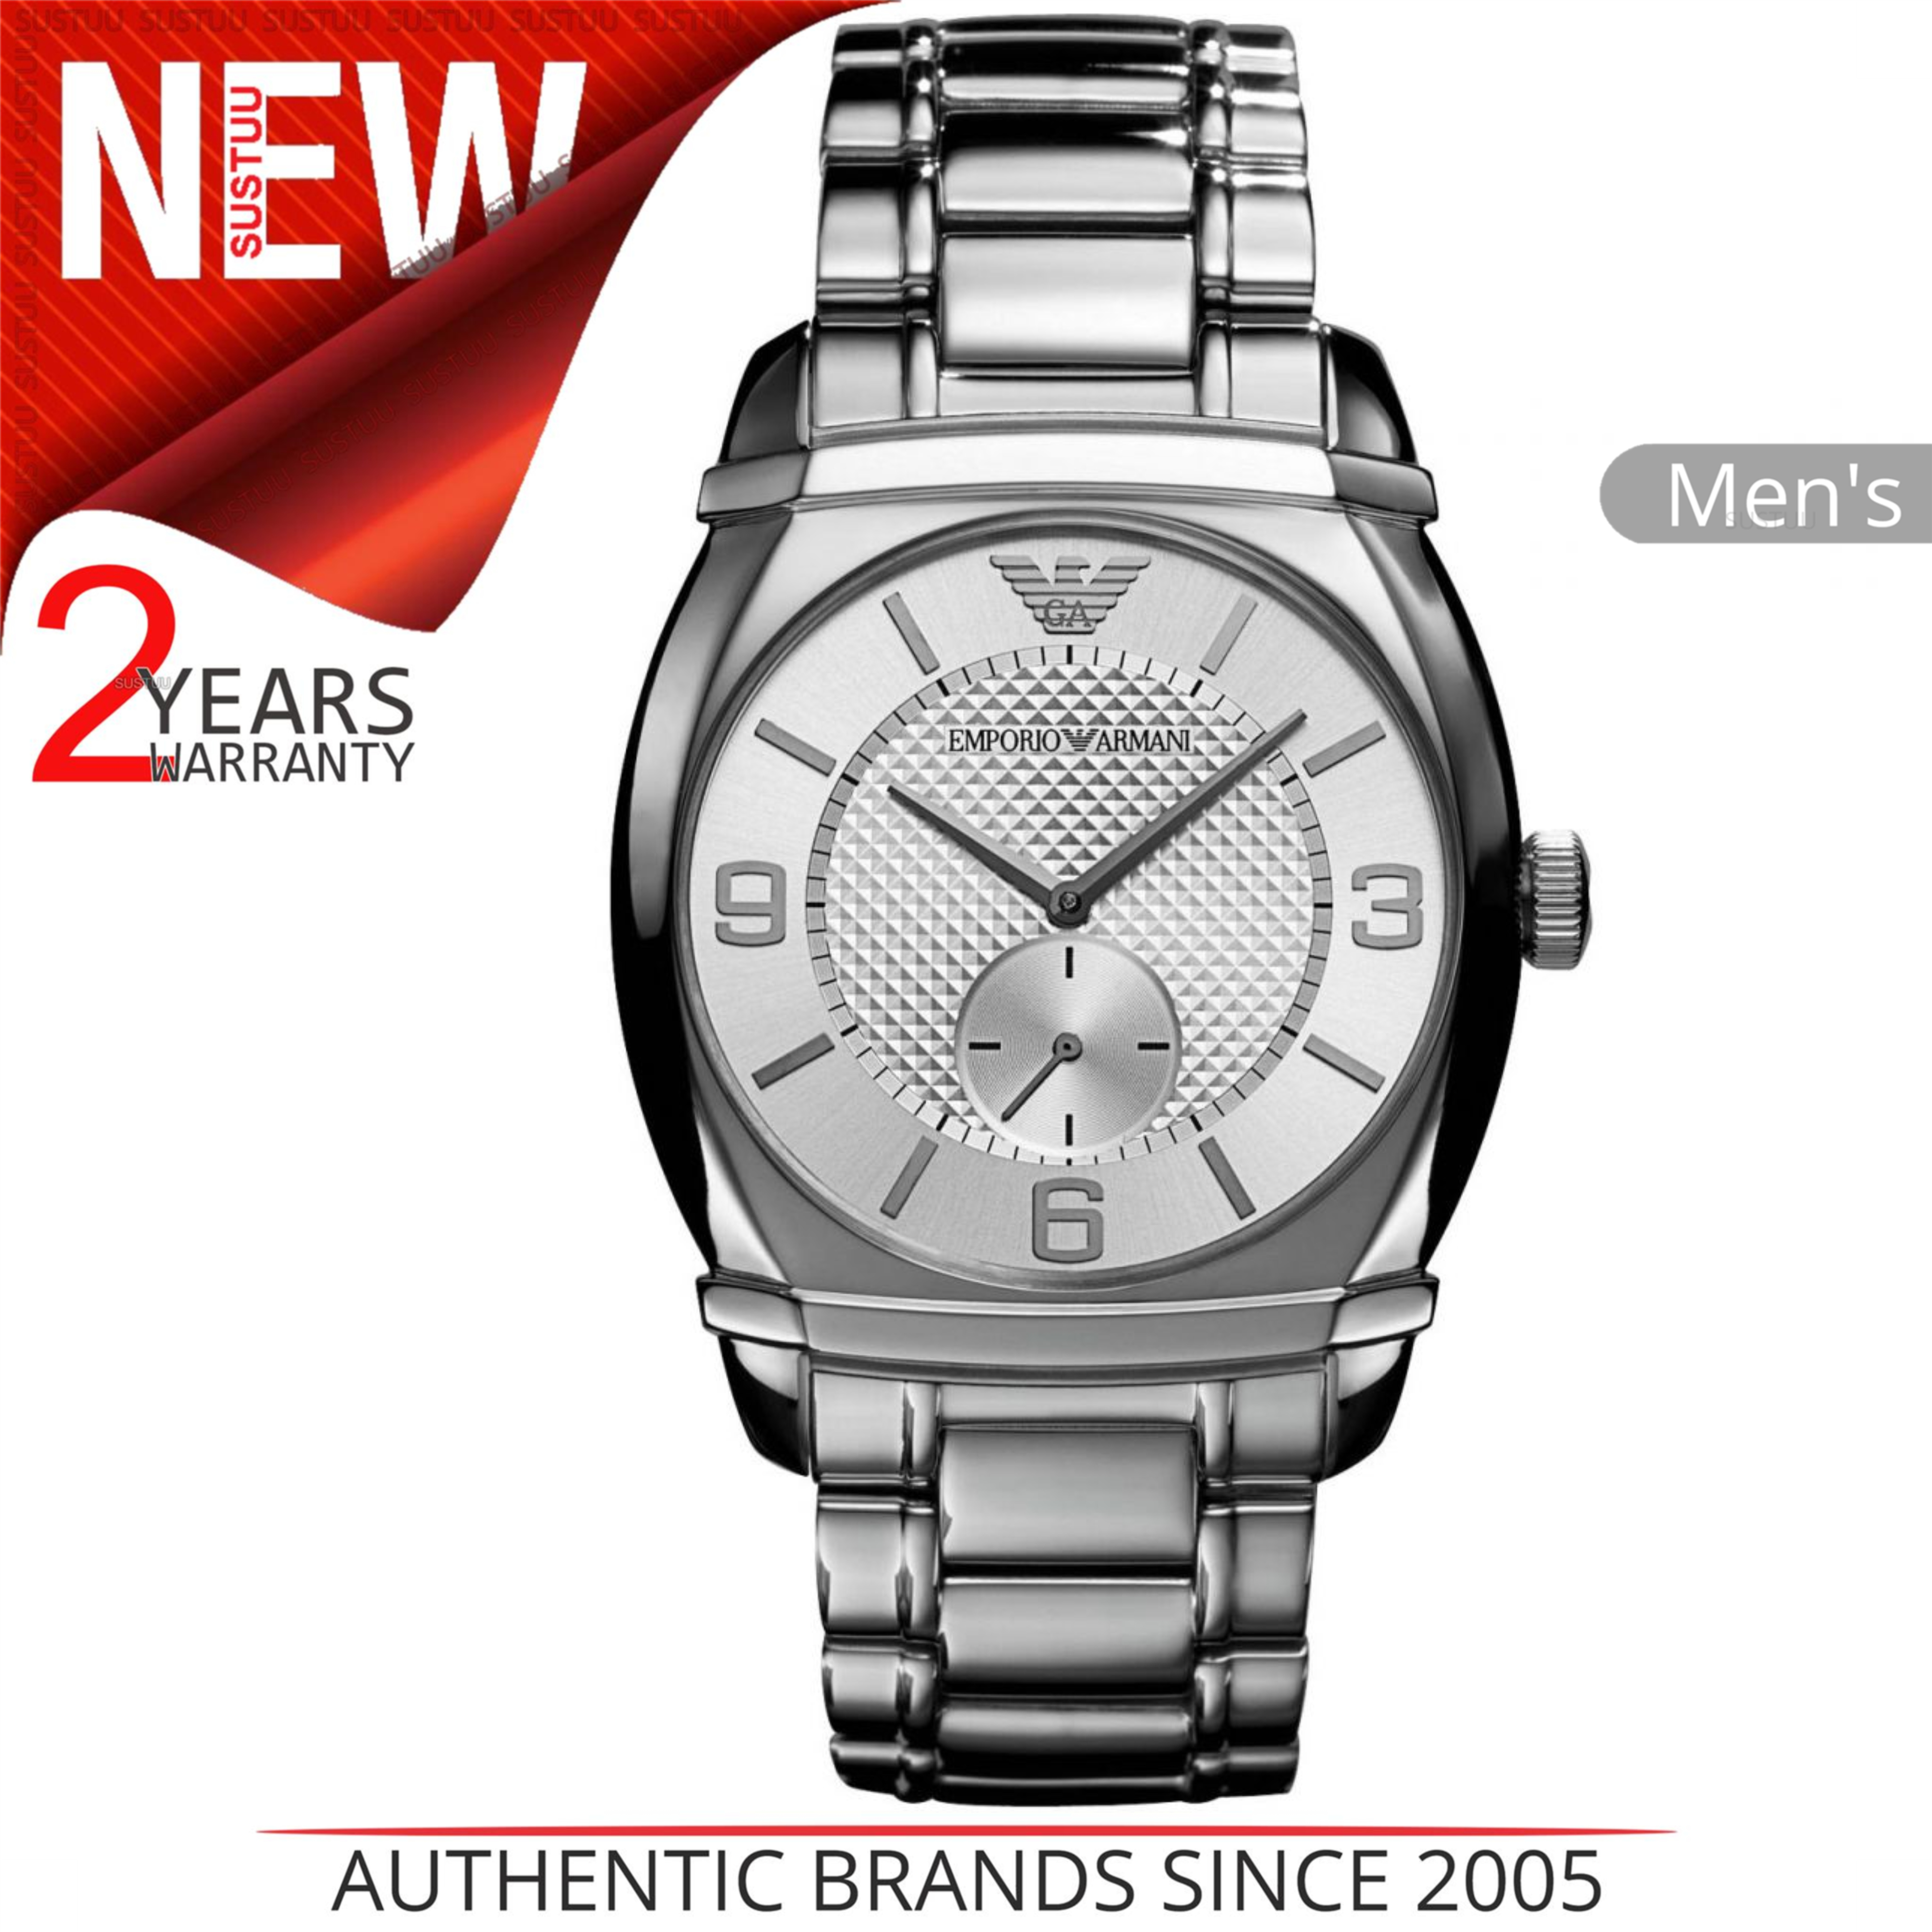 2b6de1a9cc4c Sentinel Emporio Armani Classic Men s Luxury Watch AR0339│Chronograph  Dial│Bracelet Band│